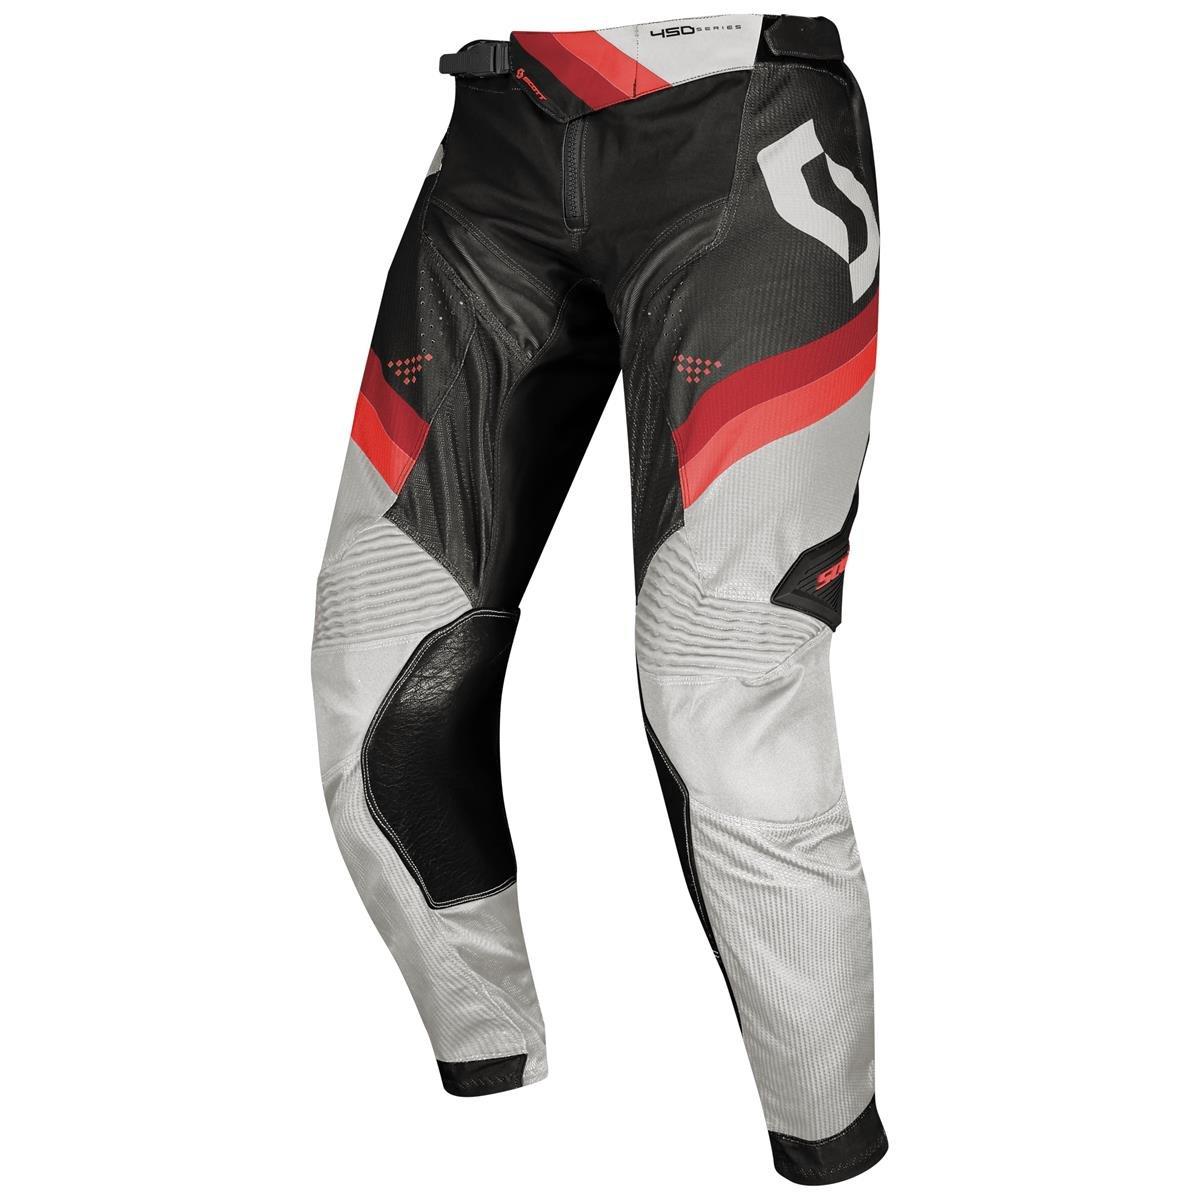 Scott 450 Podium Black/Red Pants